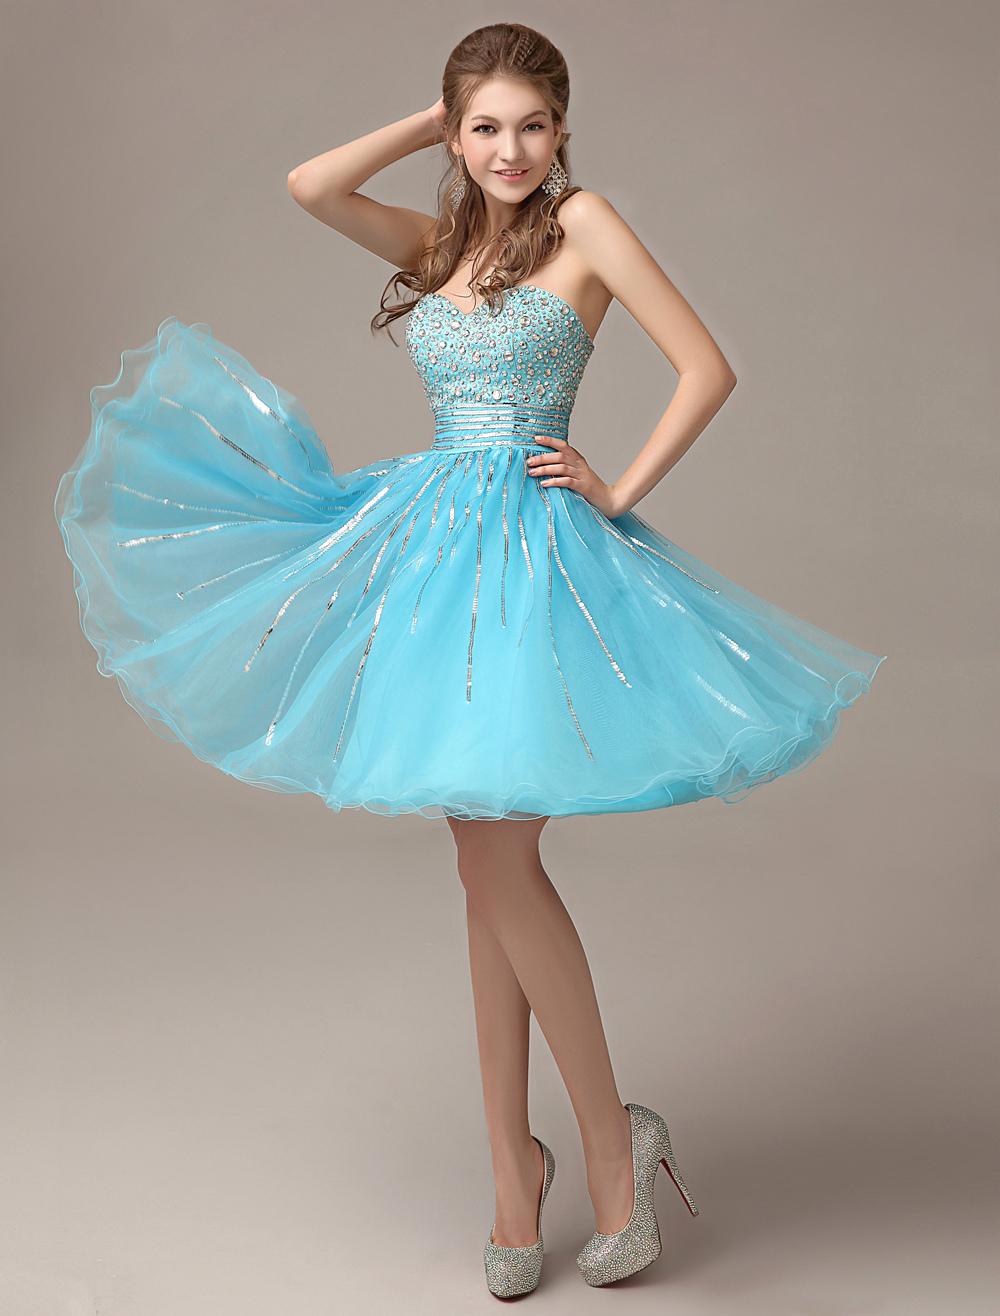 Aqua Organza Prom Dress Sweetheart Sequin Homecoming Dress A Line Rhinestone Knee Length Party Dress